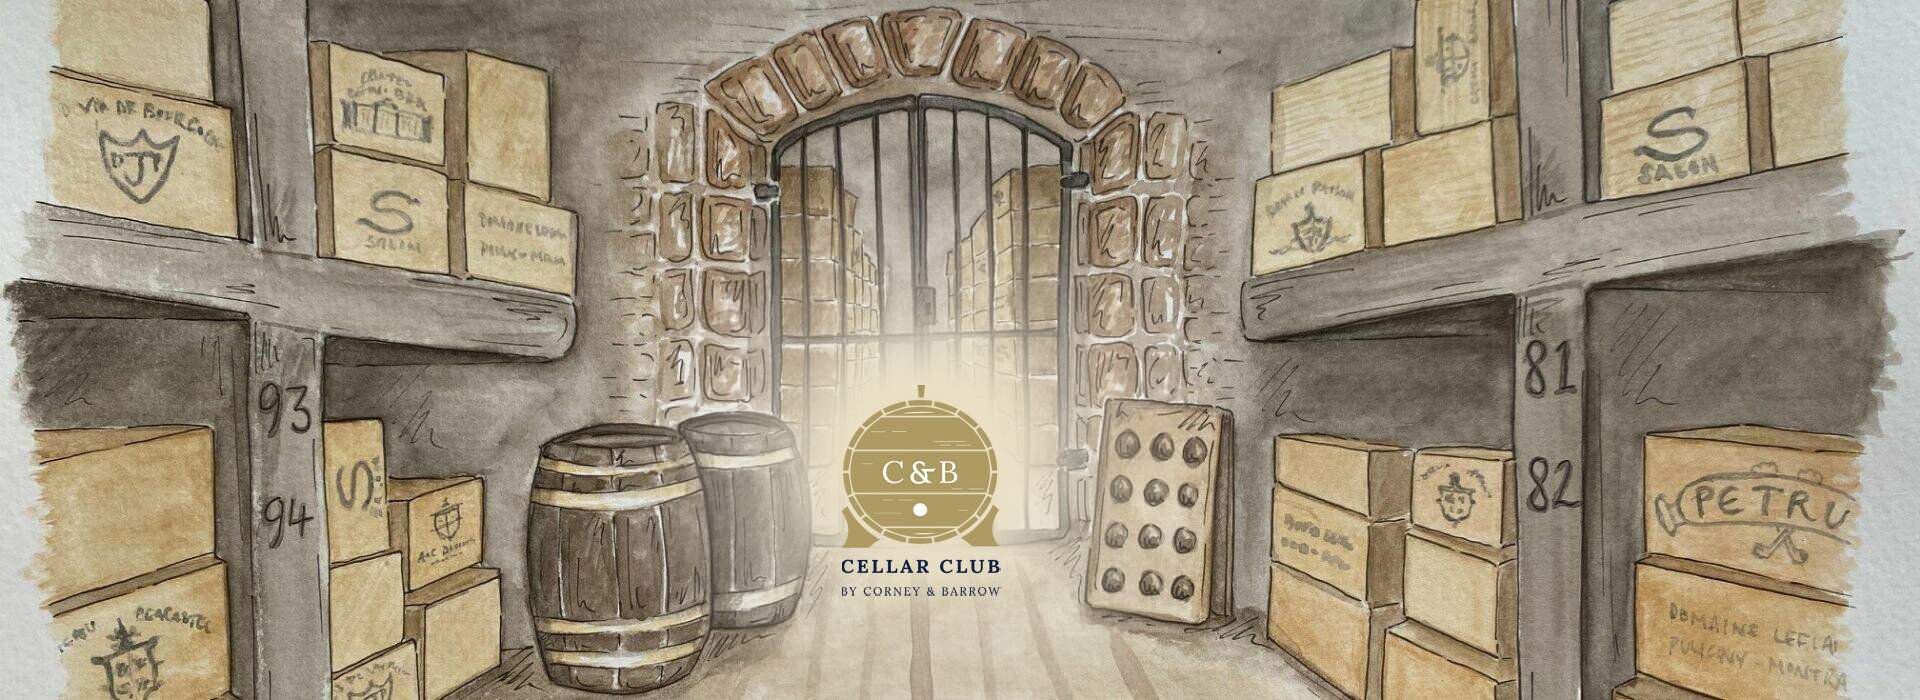 wine cellar club examples